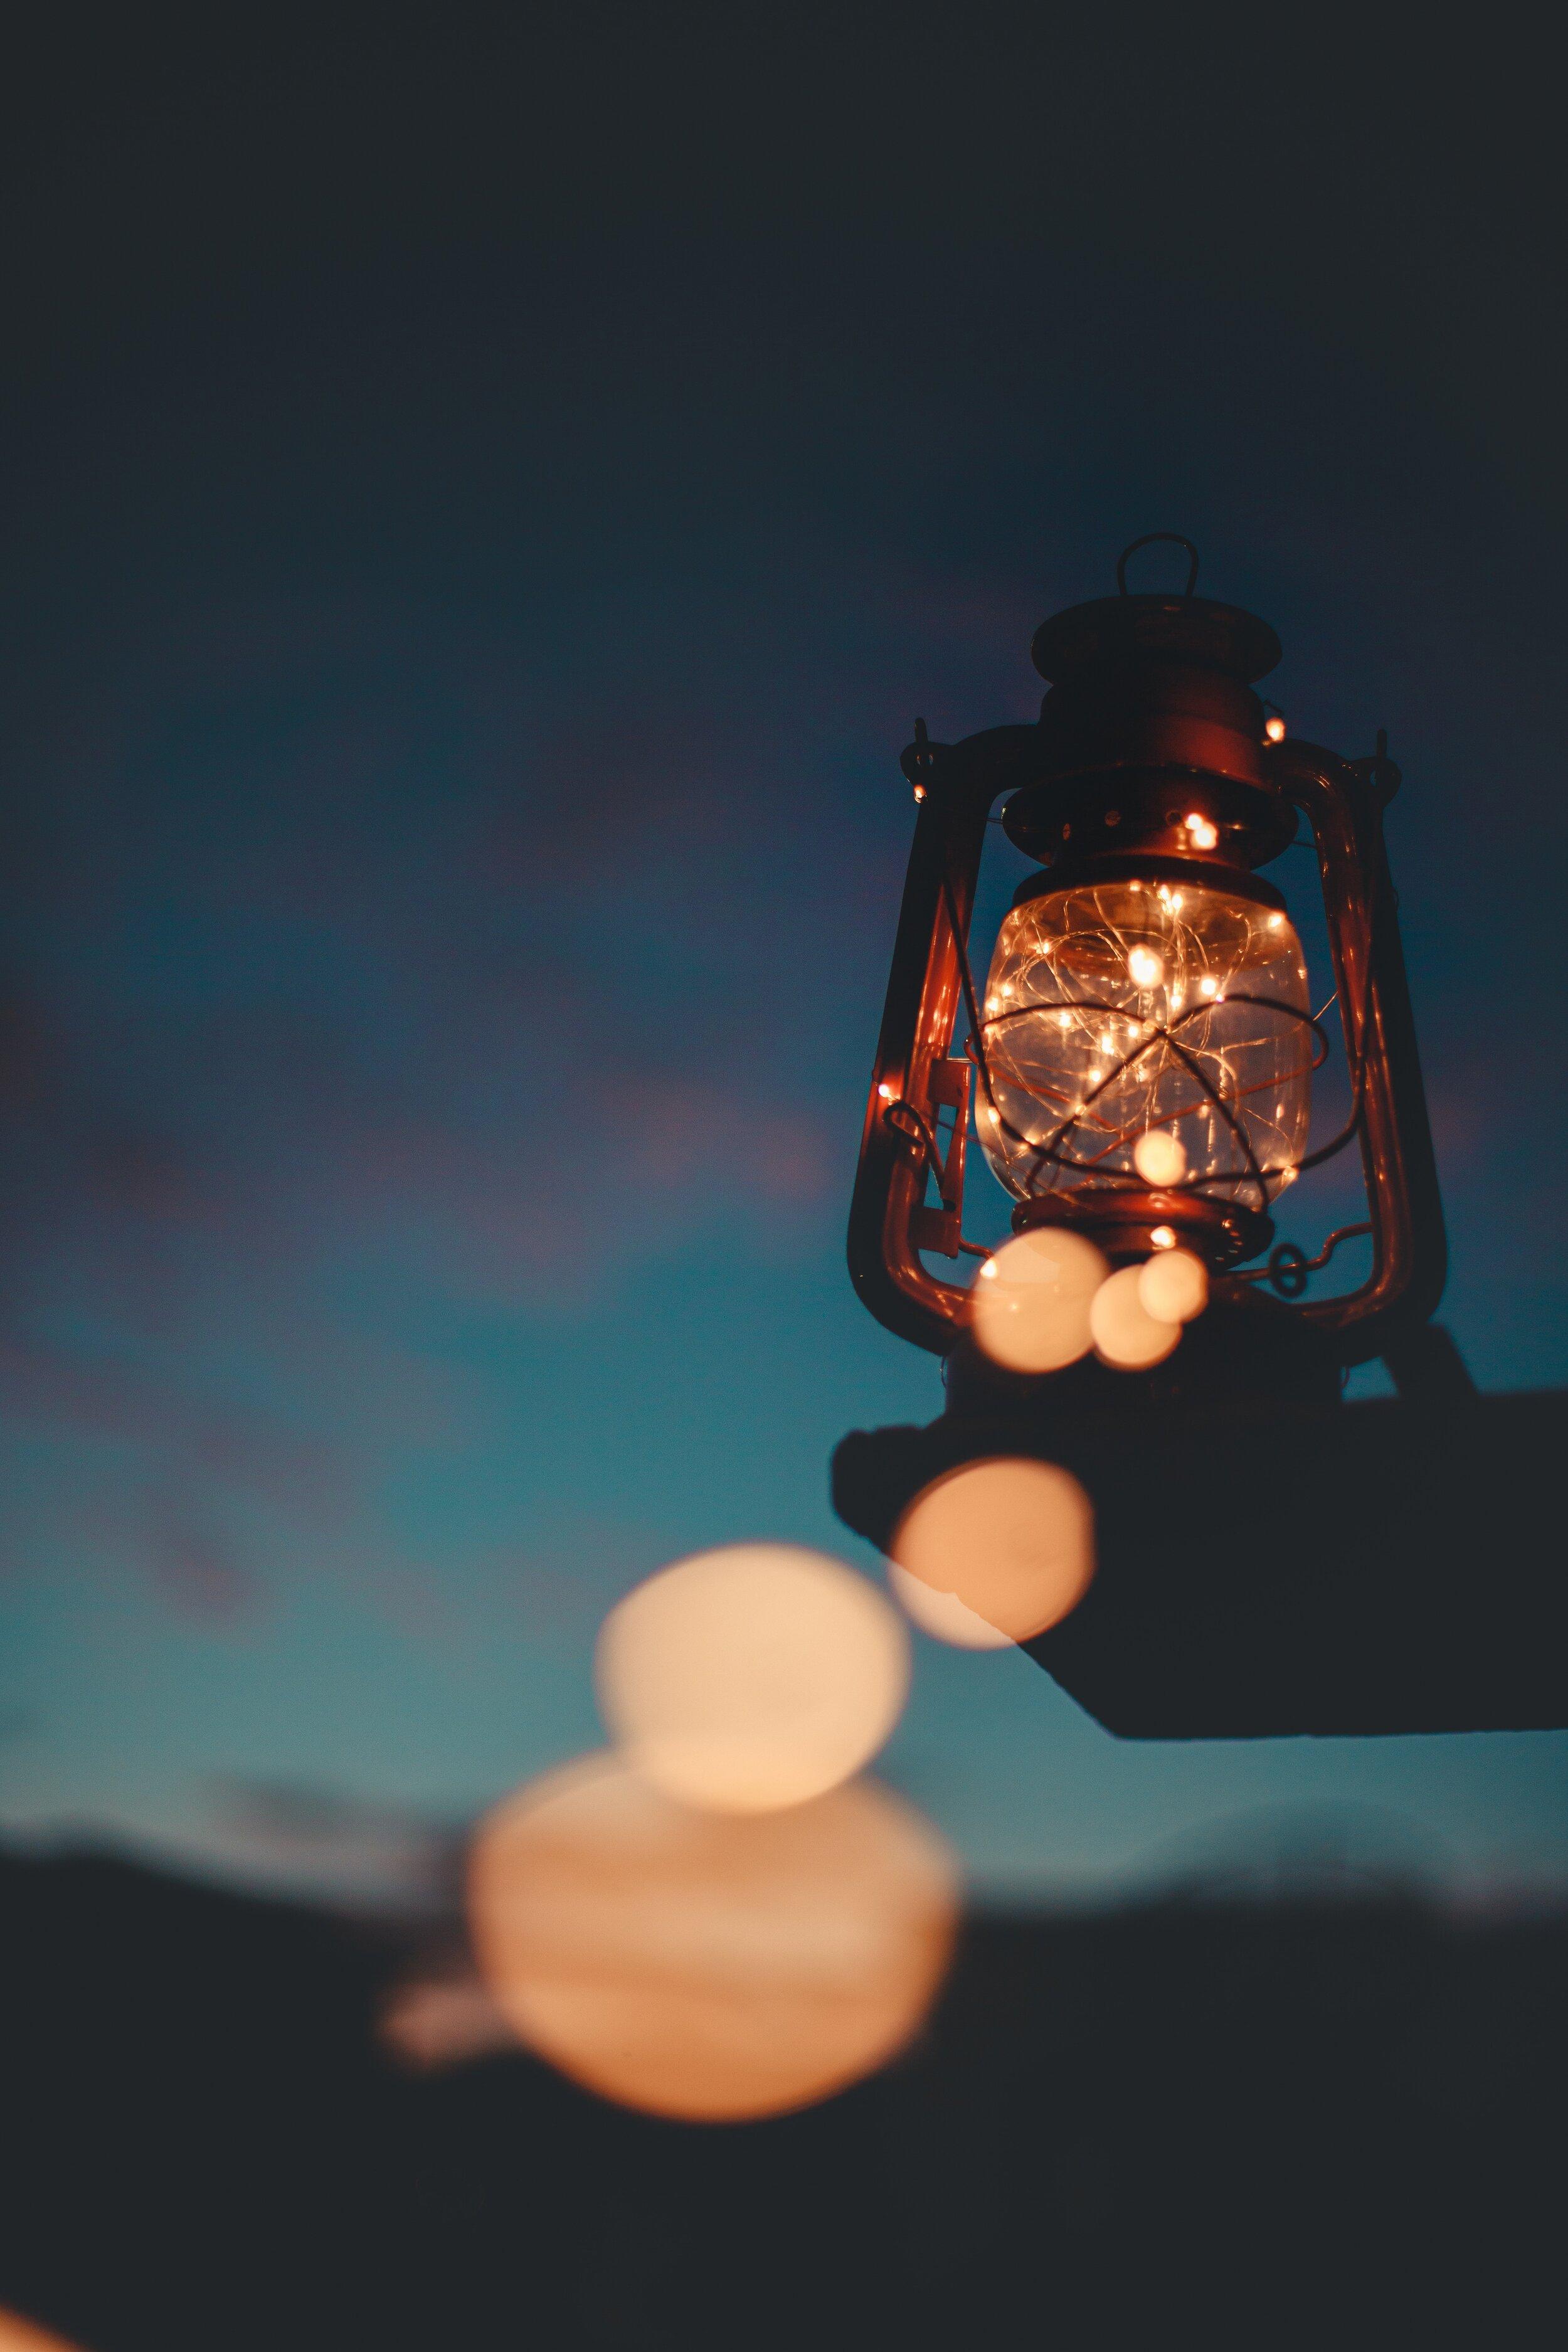 lamp-lantern-light-2585617.jpg